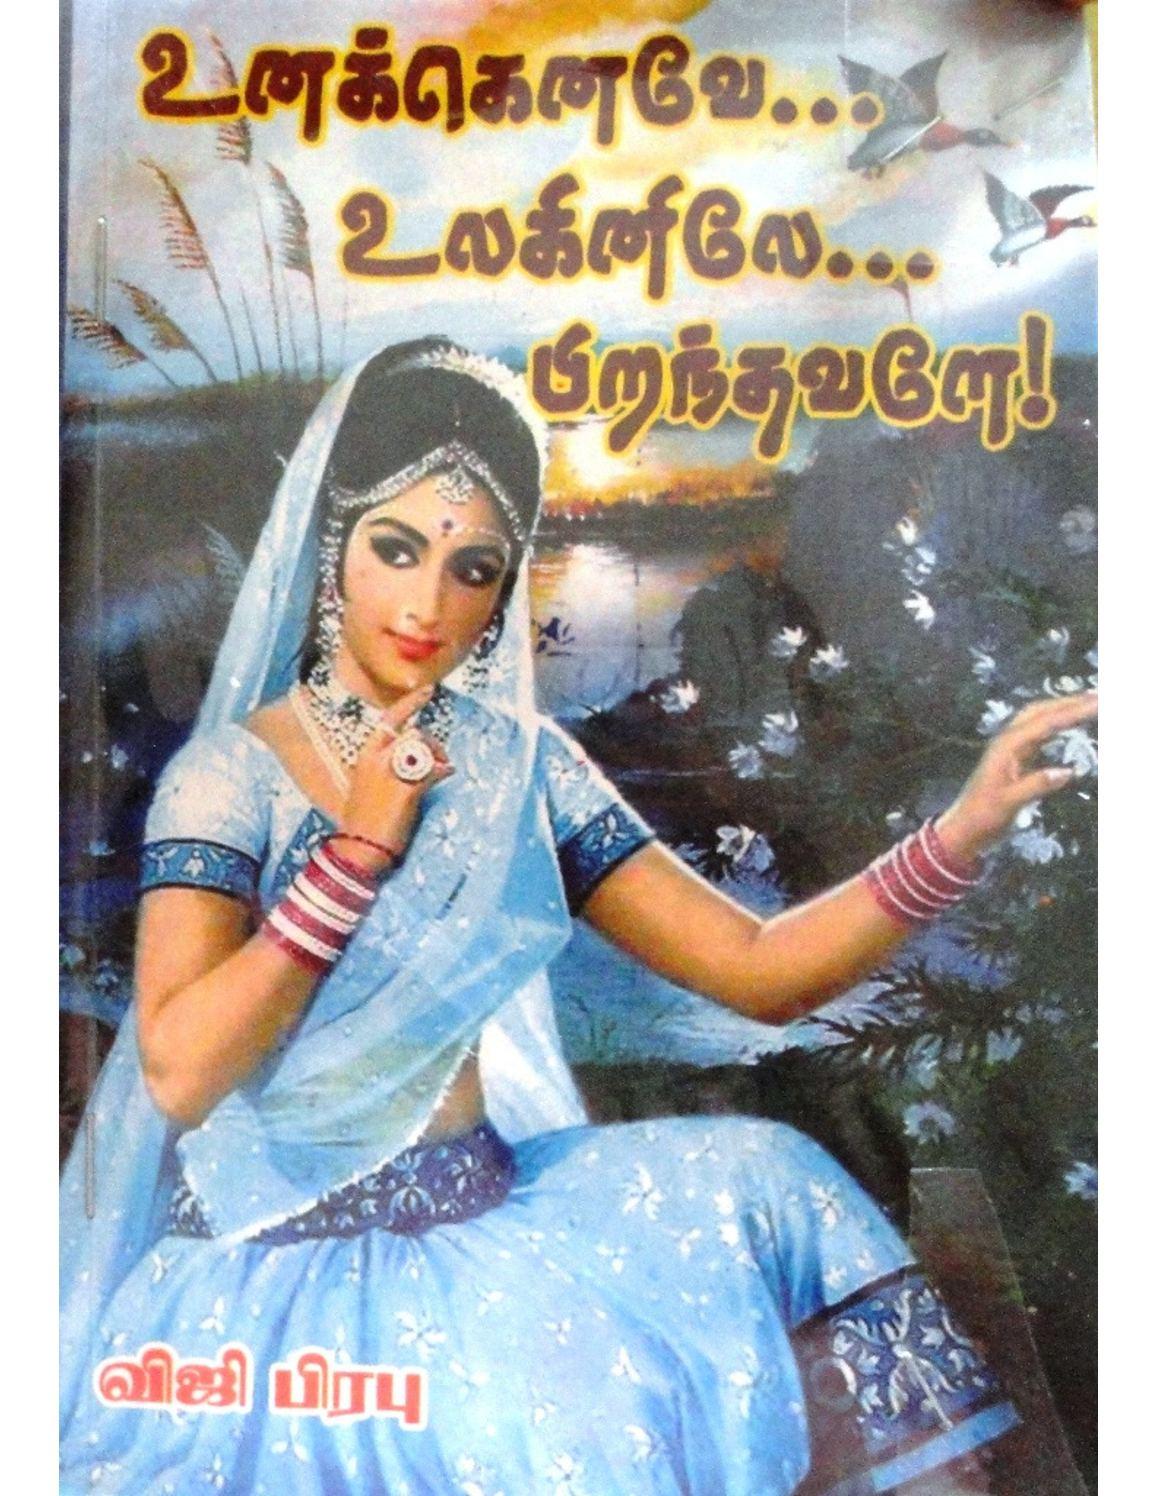 Calaméo - Viji prabhu novel Unakenave Ulaginil Piranthavale